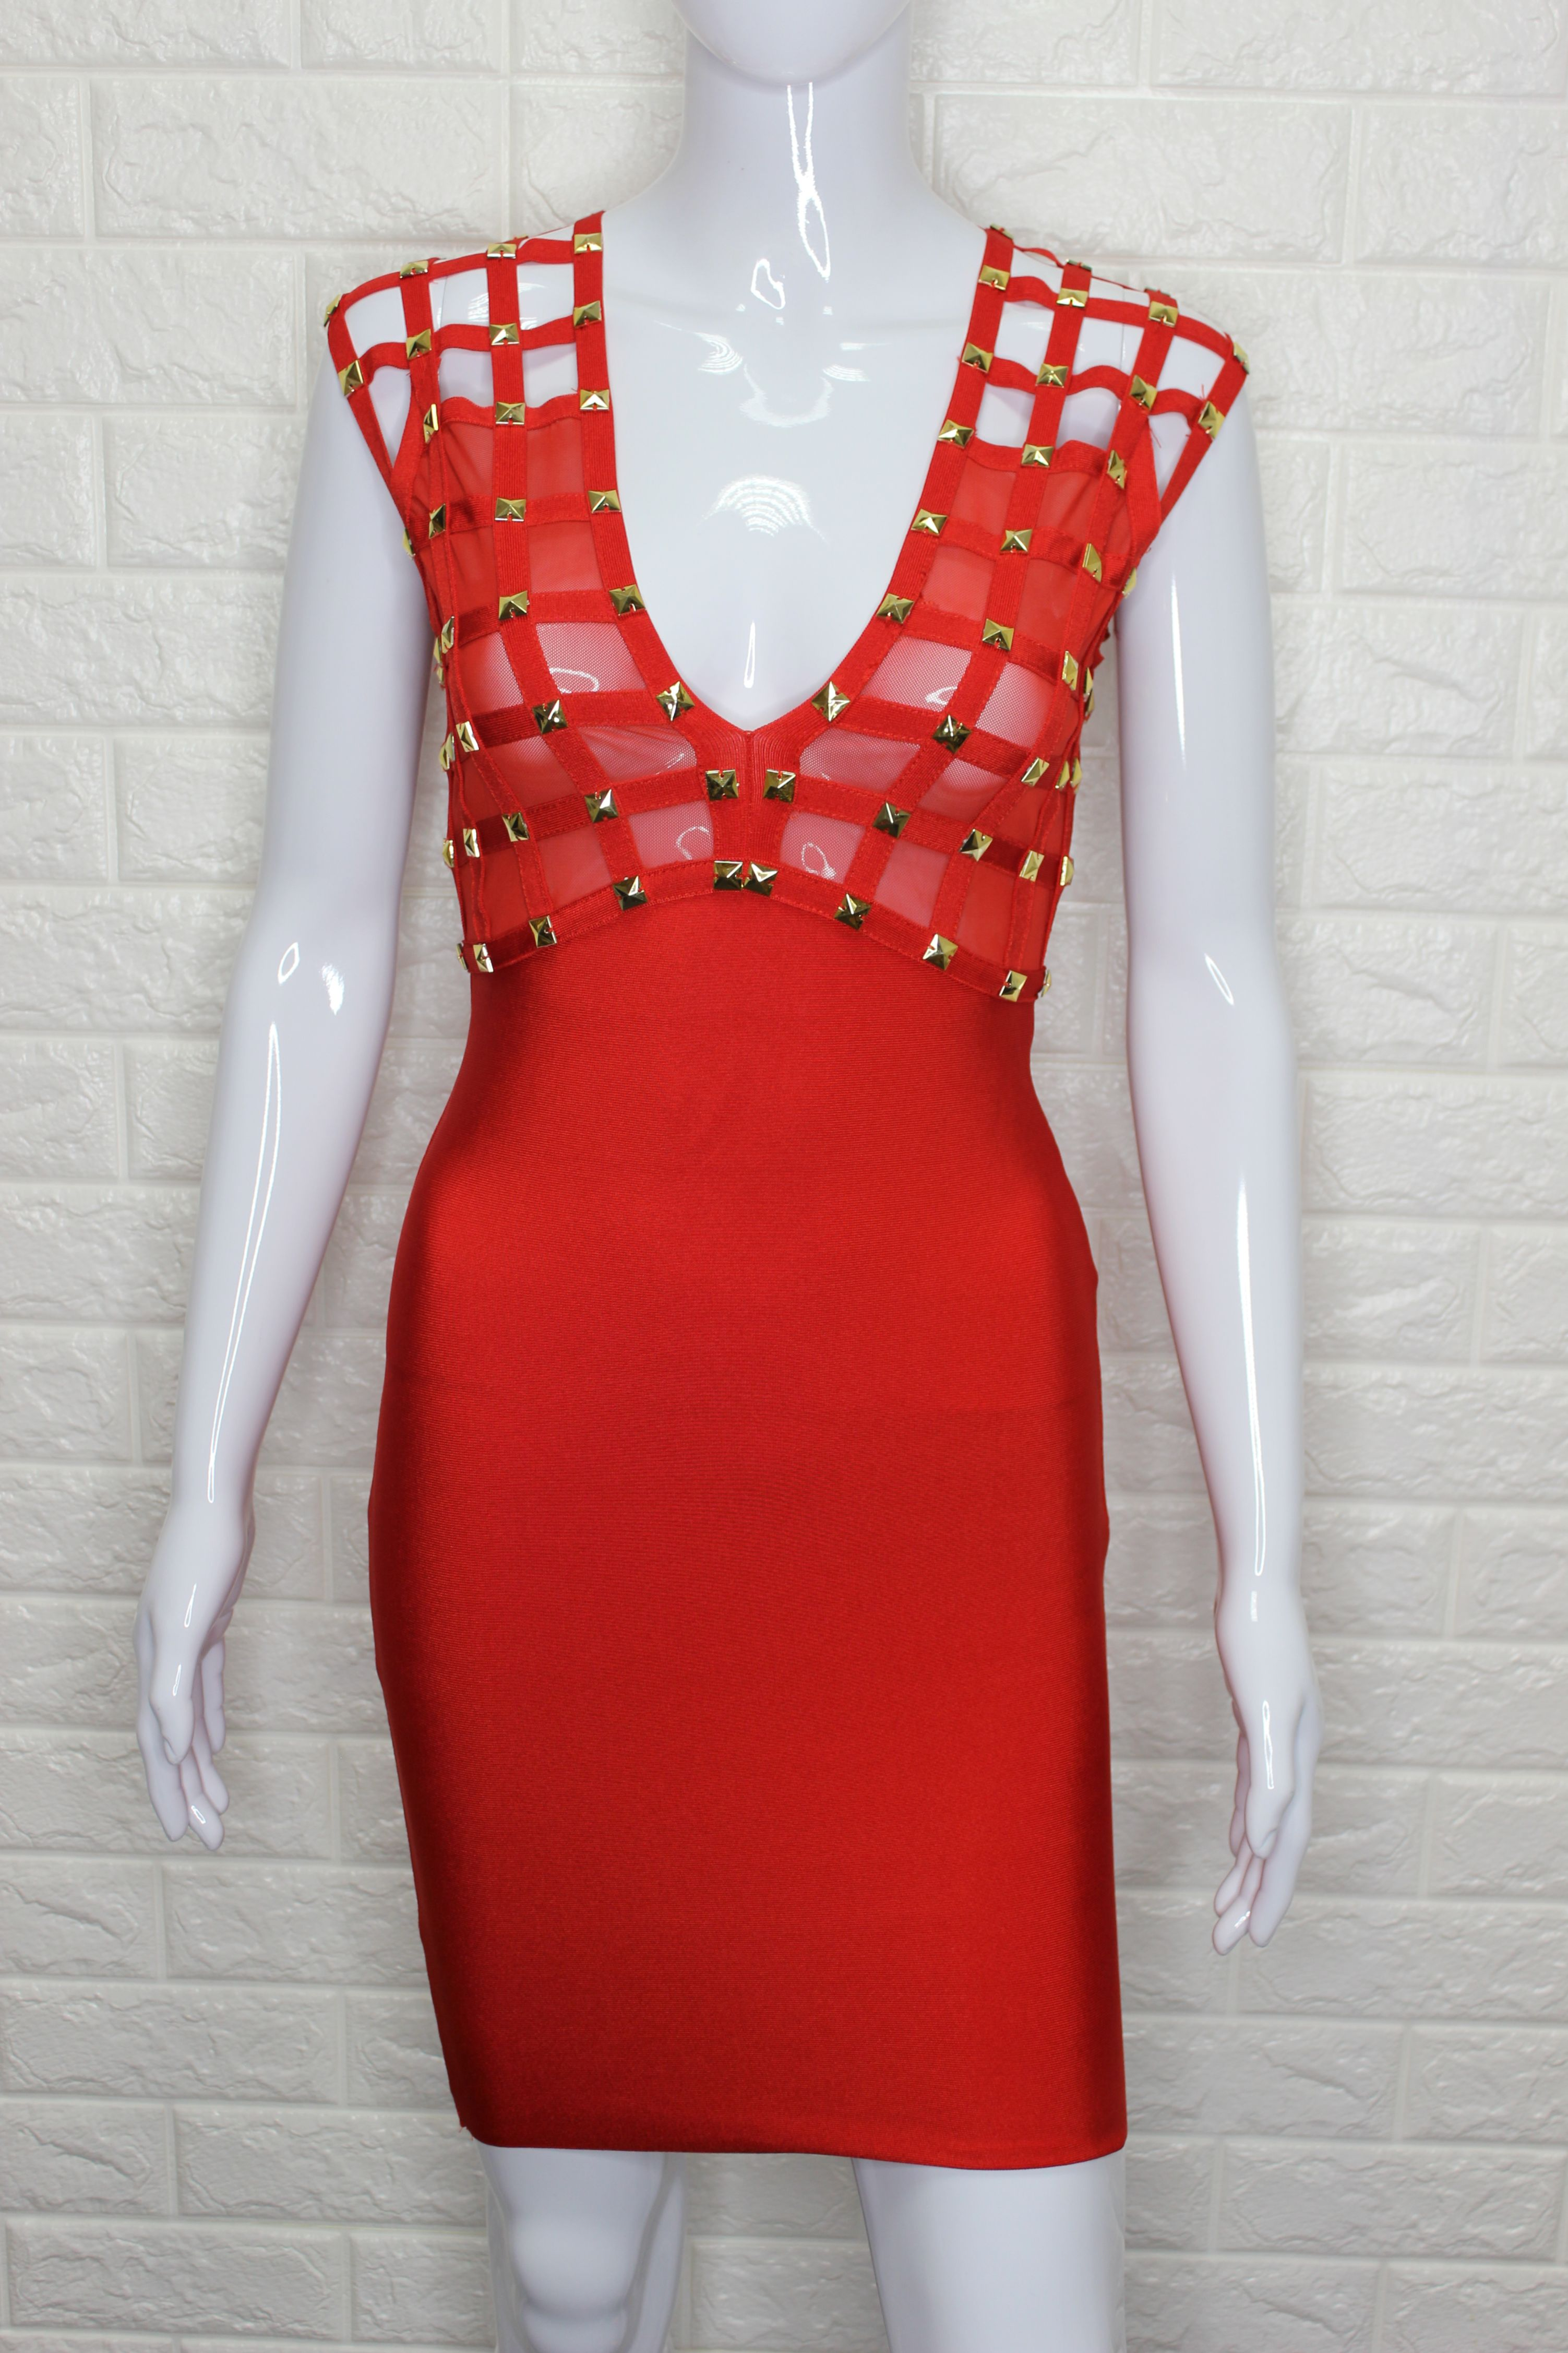 Red Bandage Mini Dress